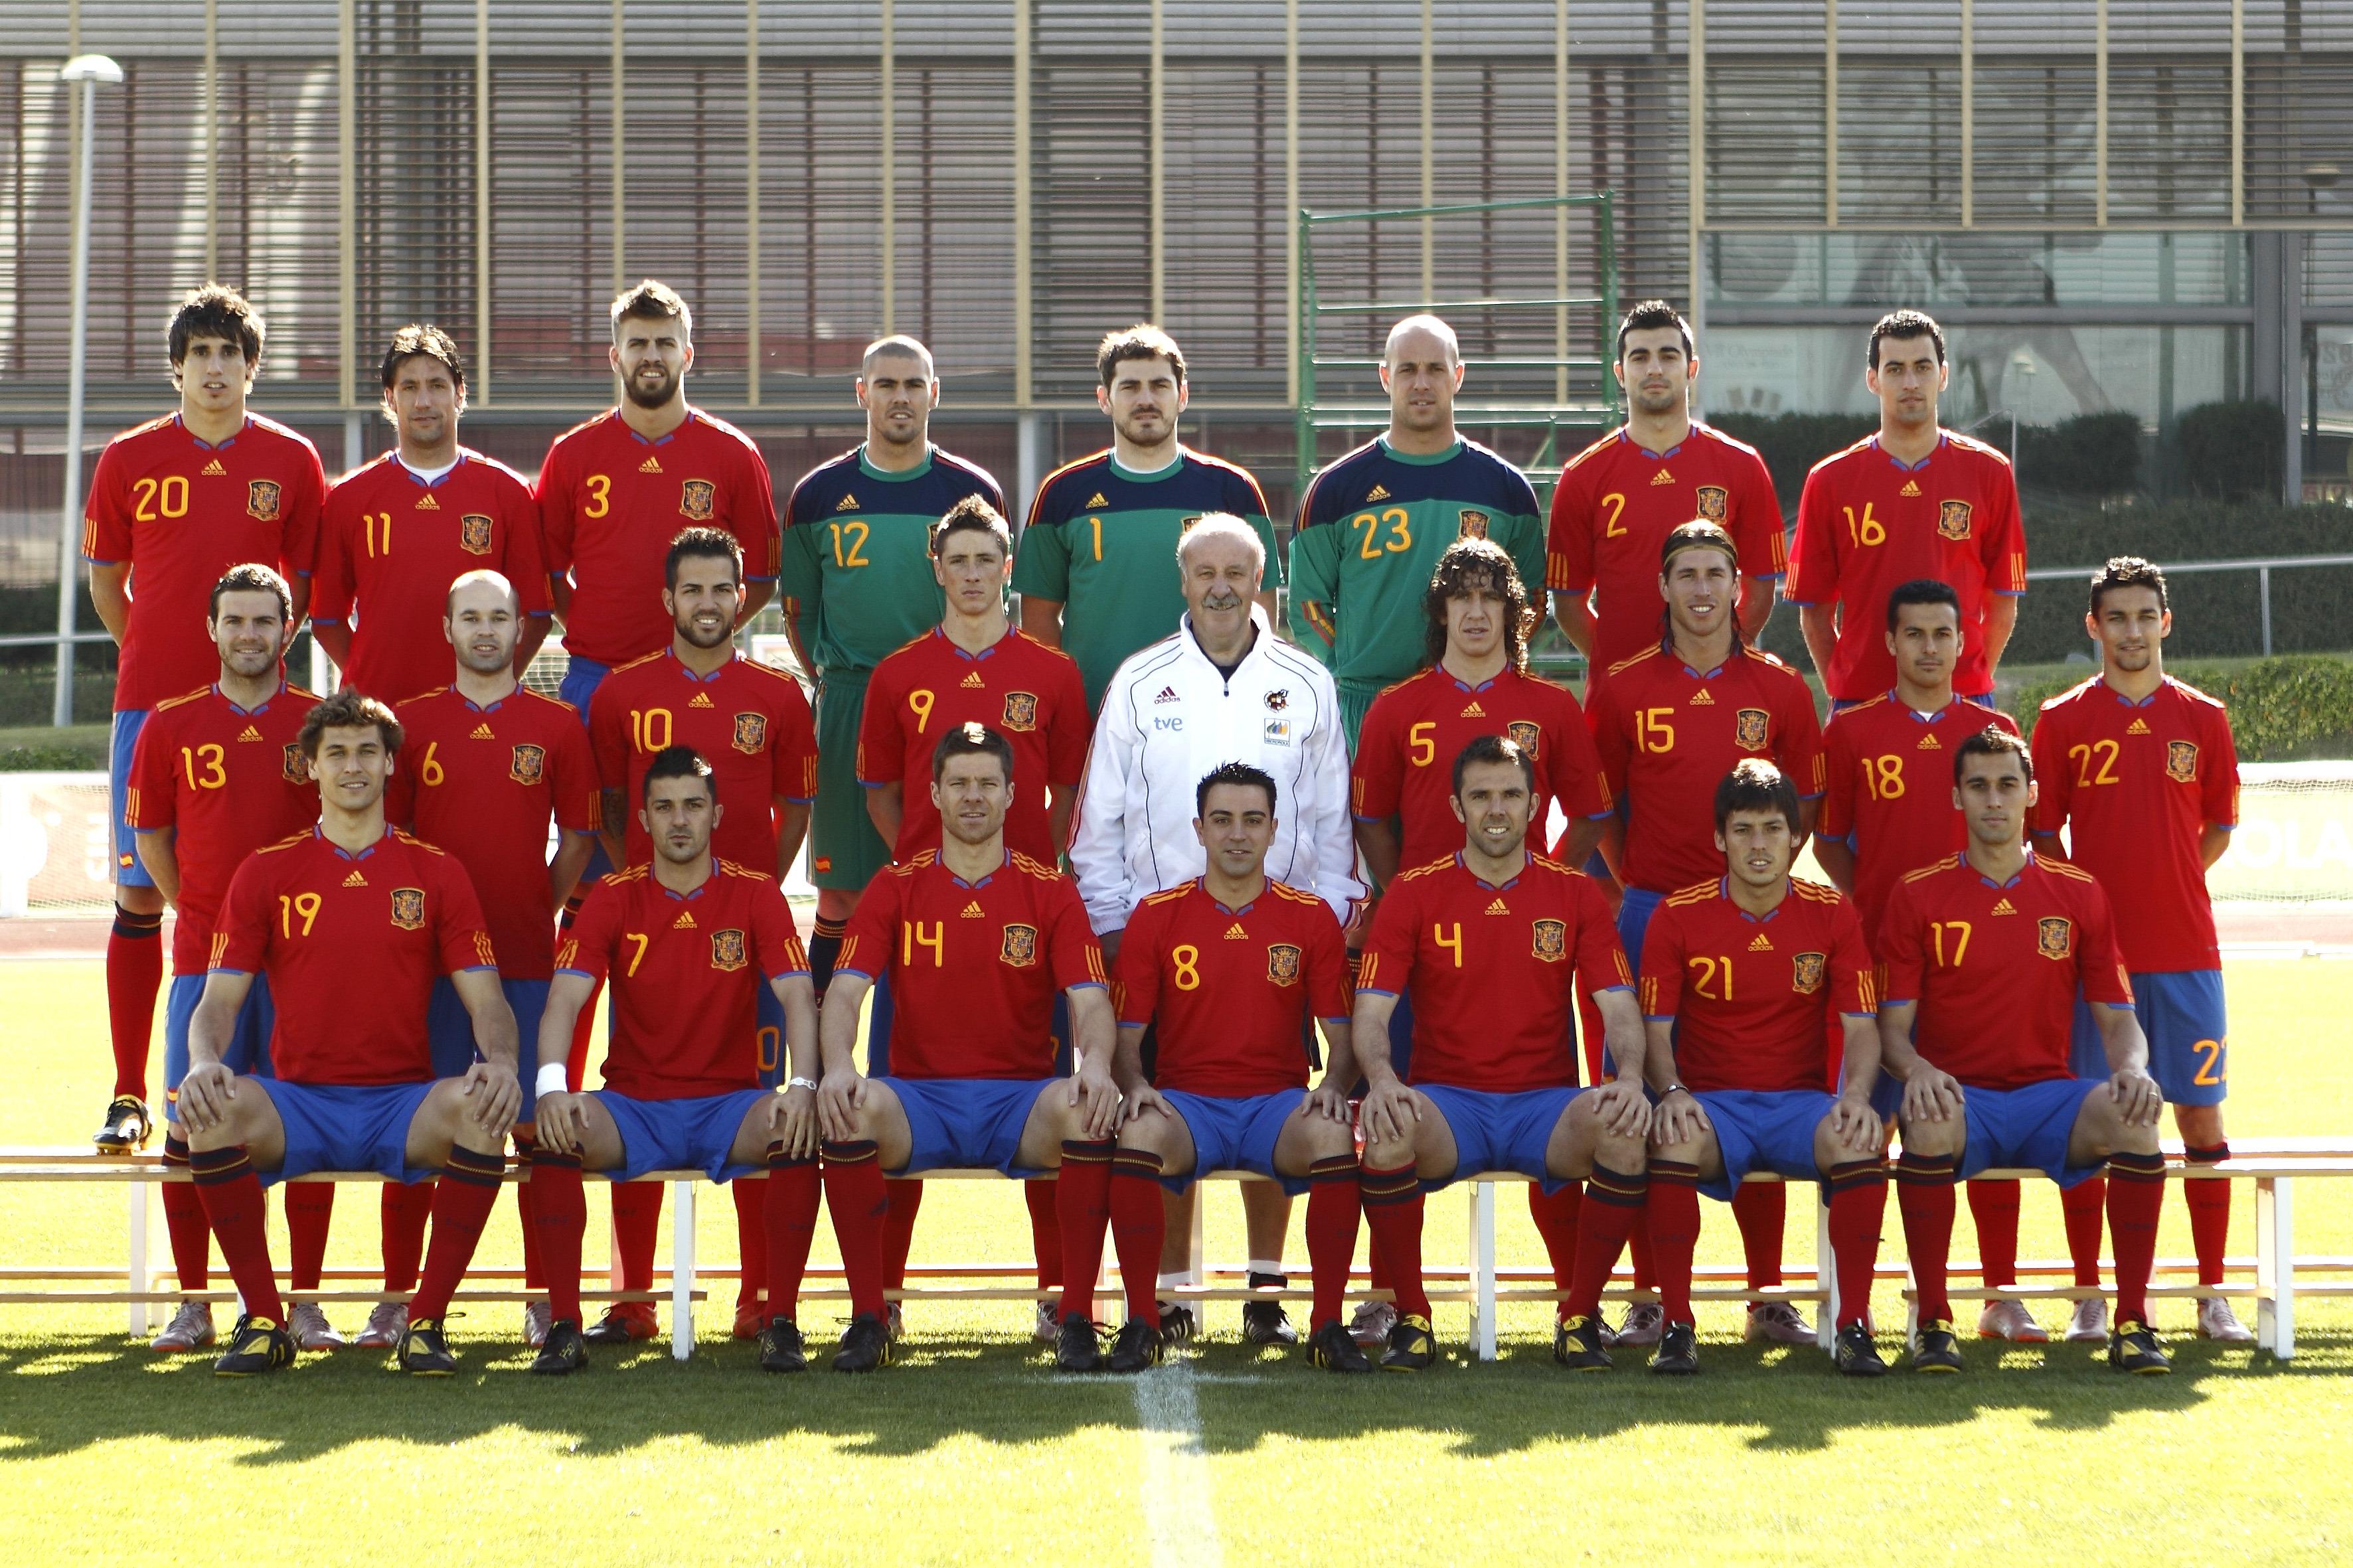 Hilo de la selección de España (selección española) Spain